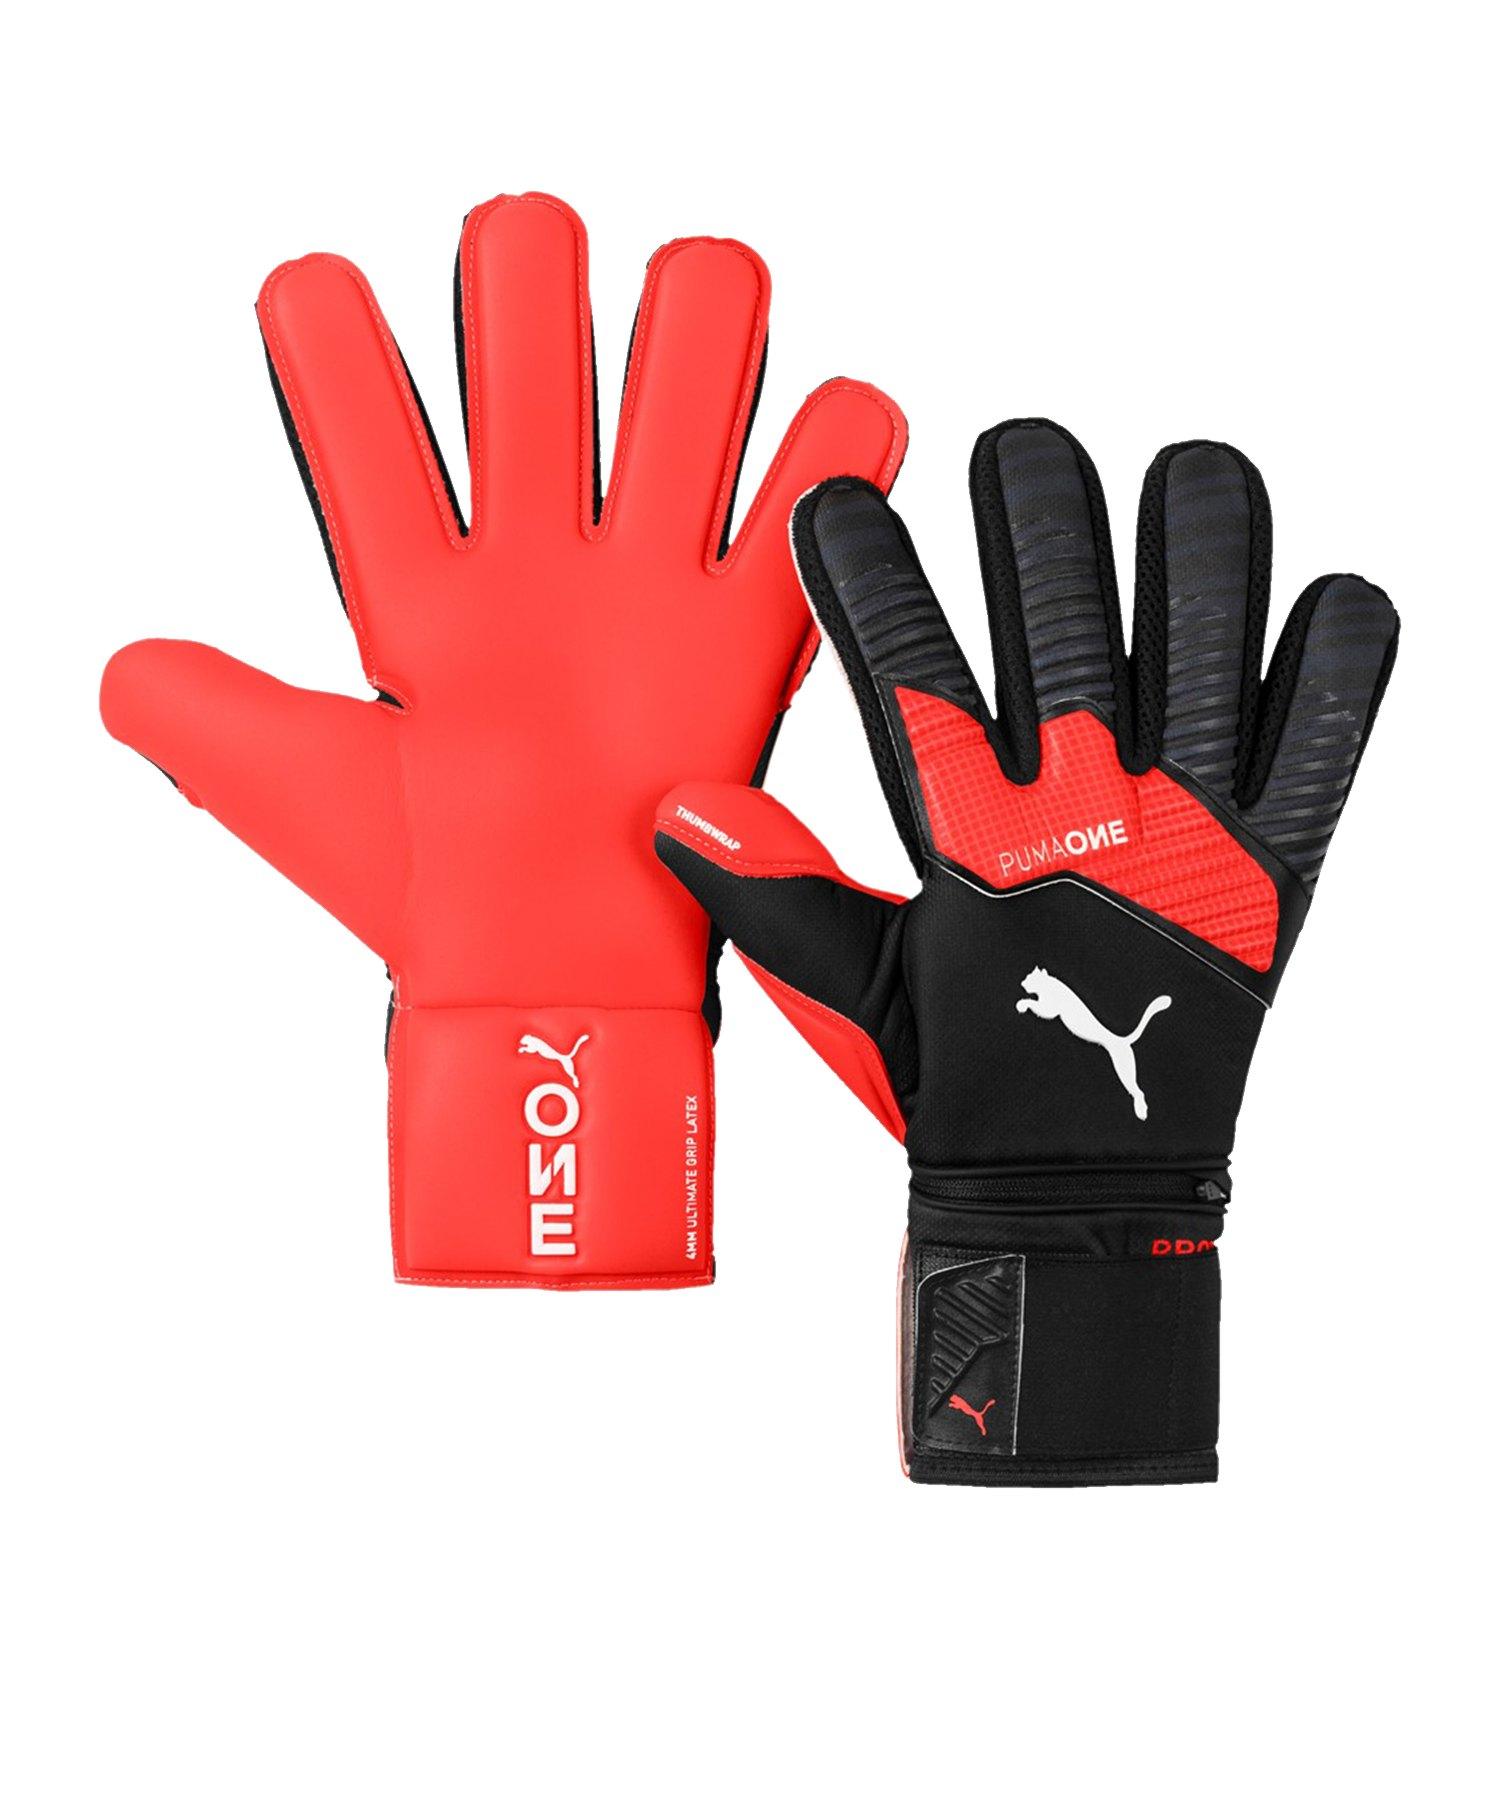 PUMA ONE Protect 1 TW-Handschuh Schwarz Rot F01 - Schwarz